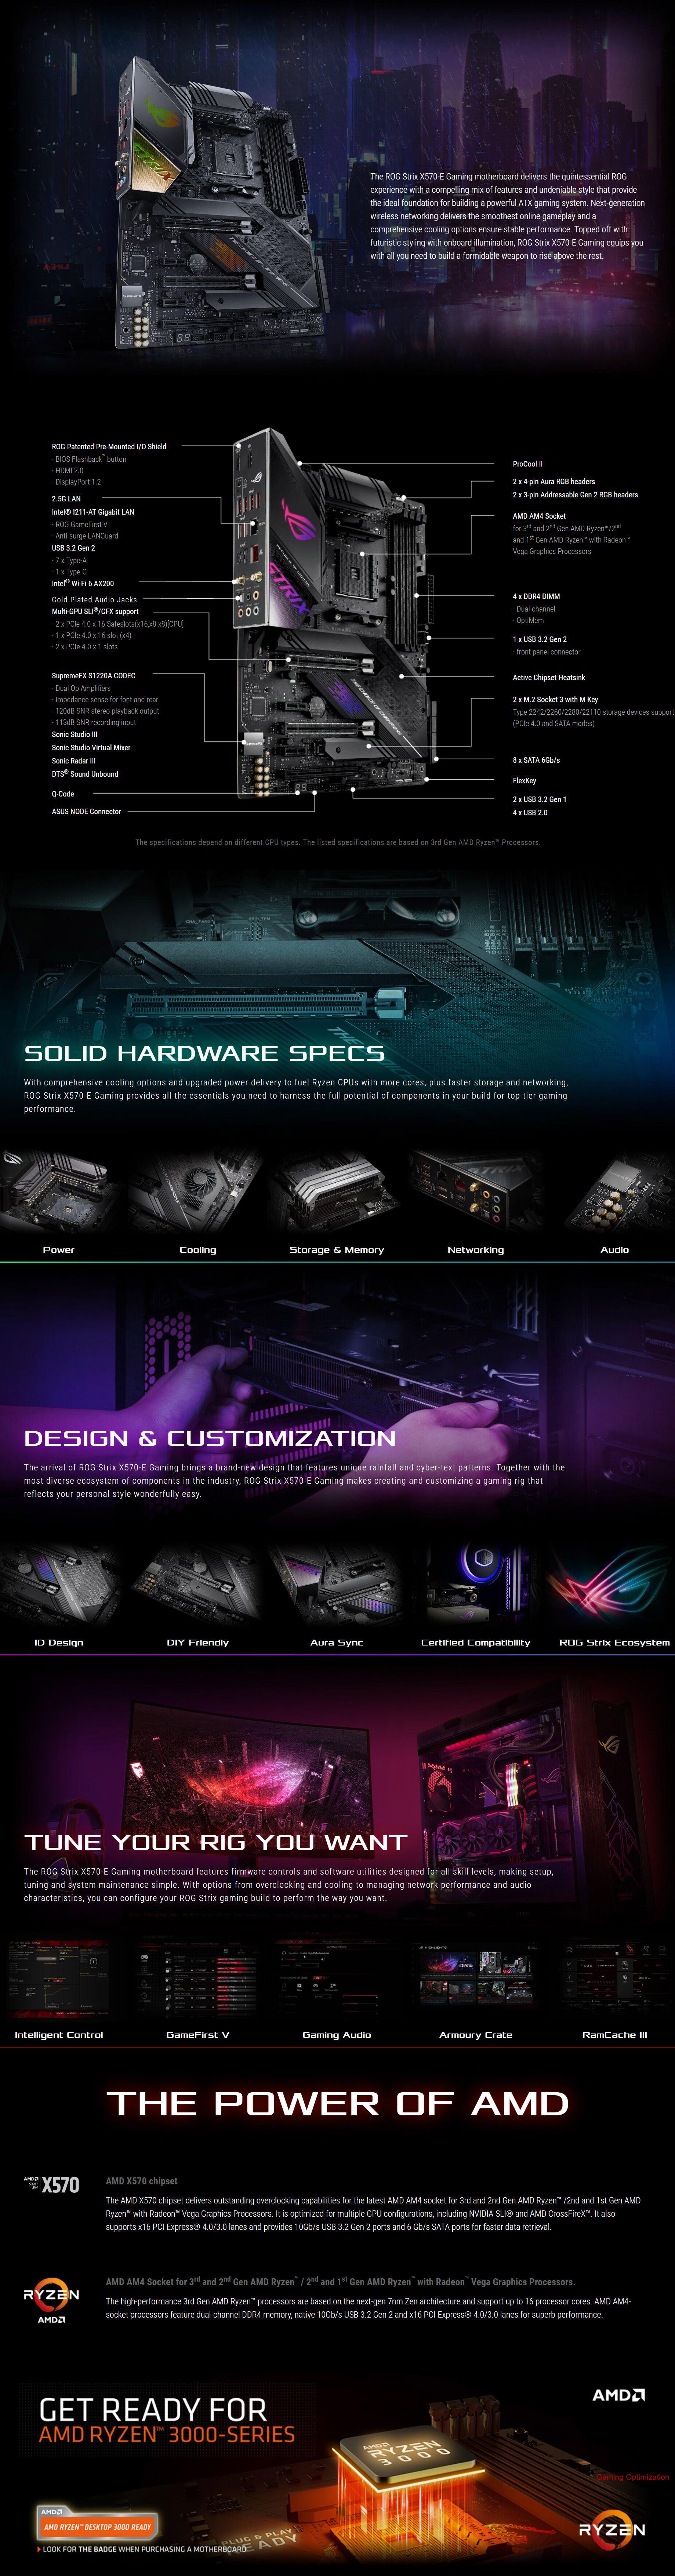 Asus ROG Strix X570-E Gaming AM4 ATX Motherboard